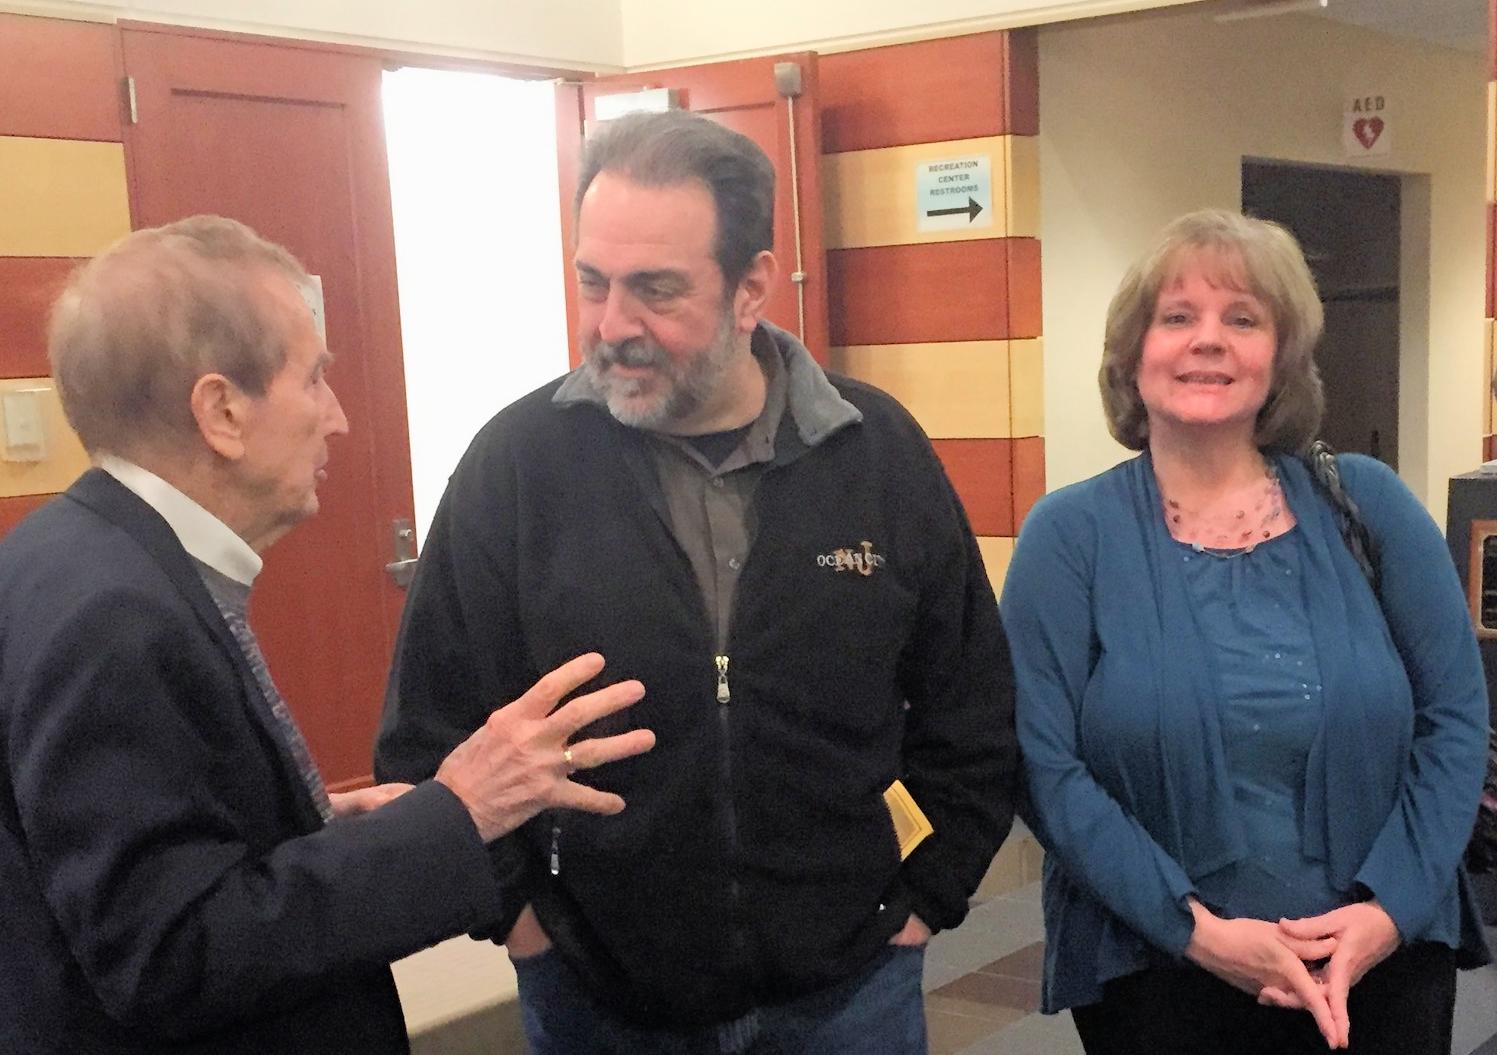 Bob McGrath, John & Kathy Palatucci